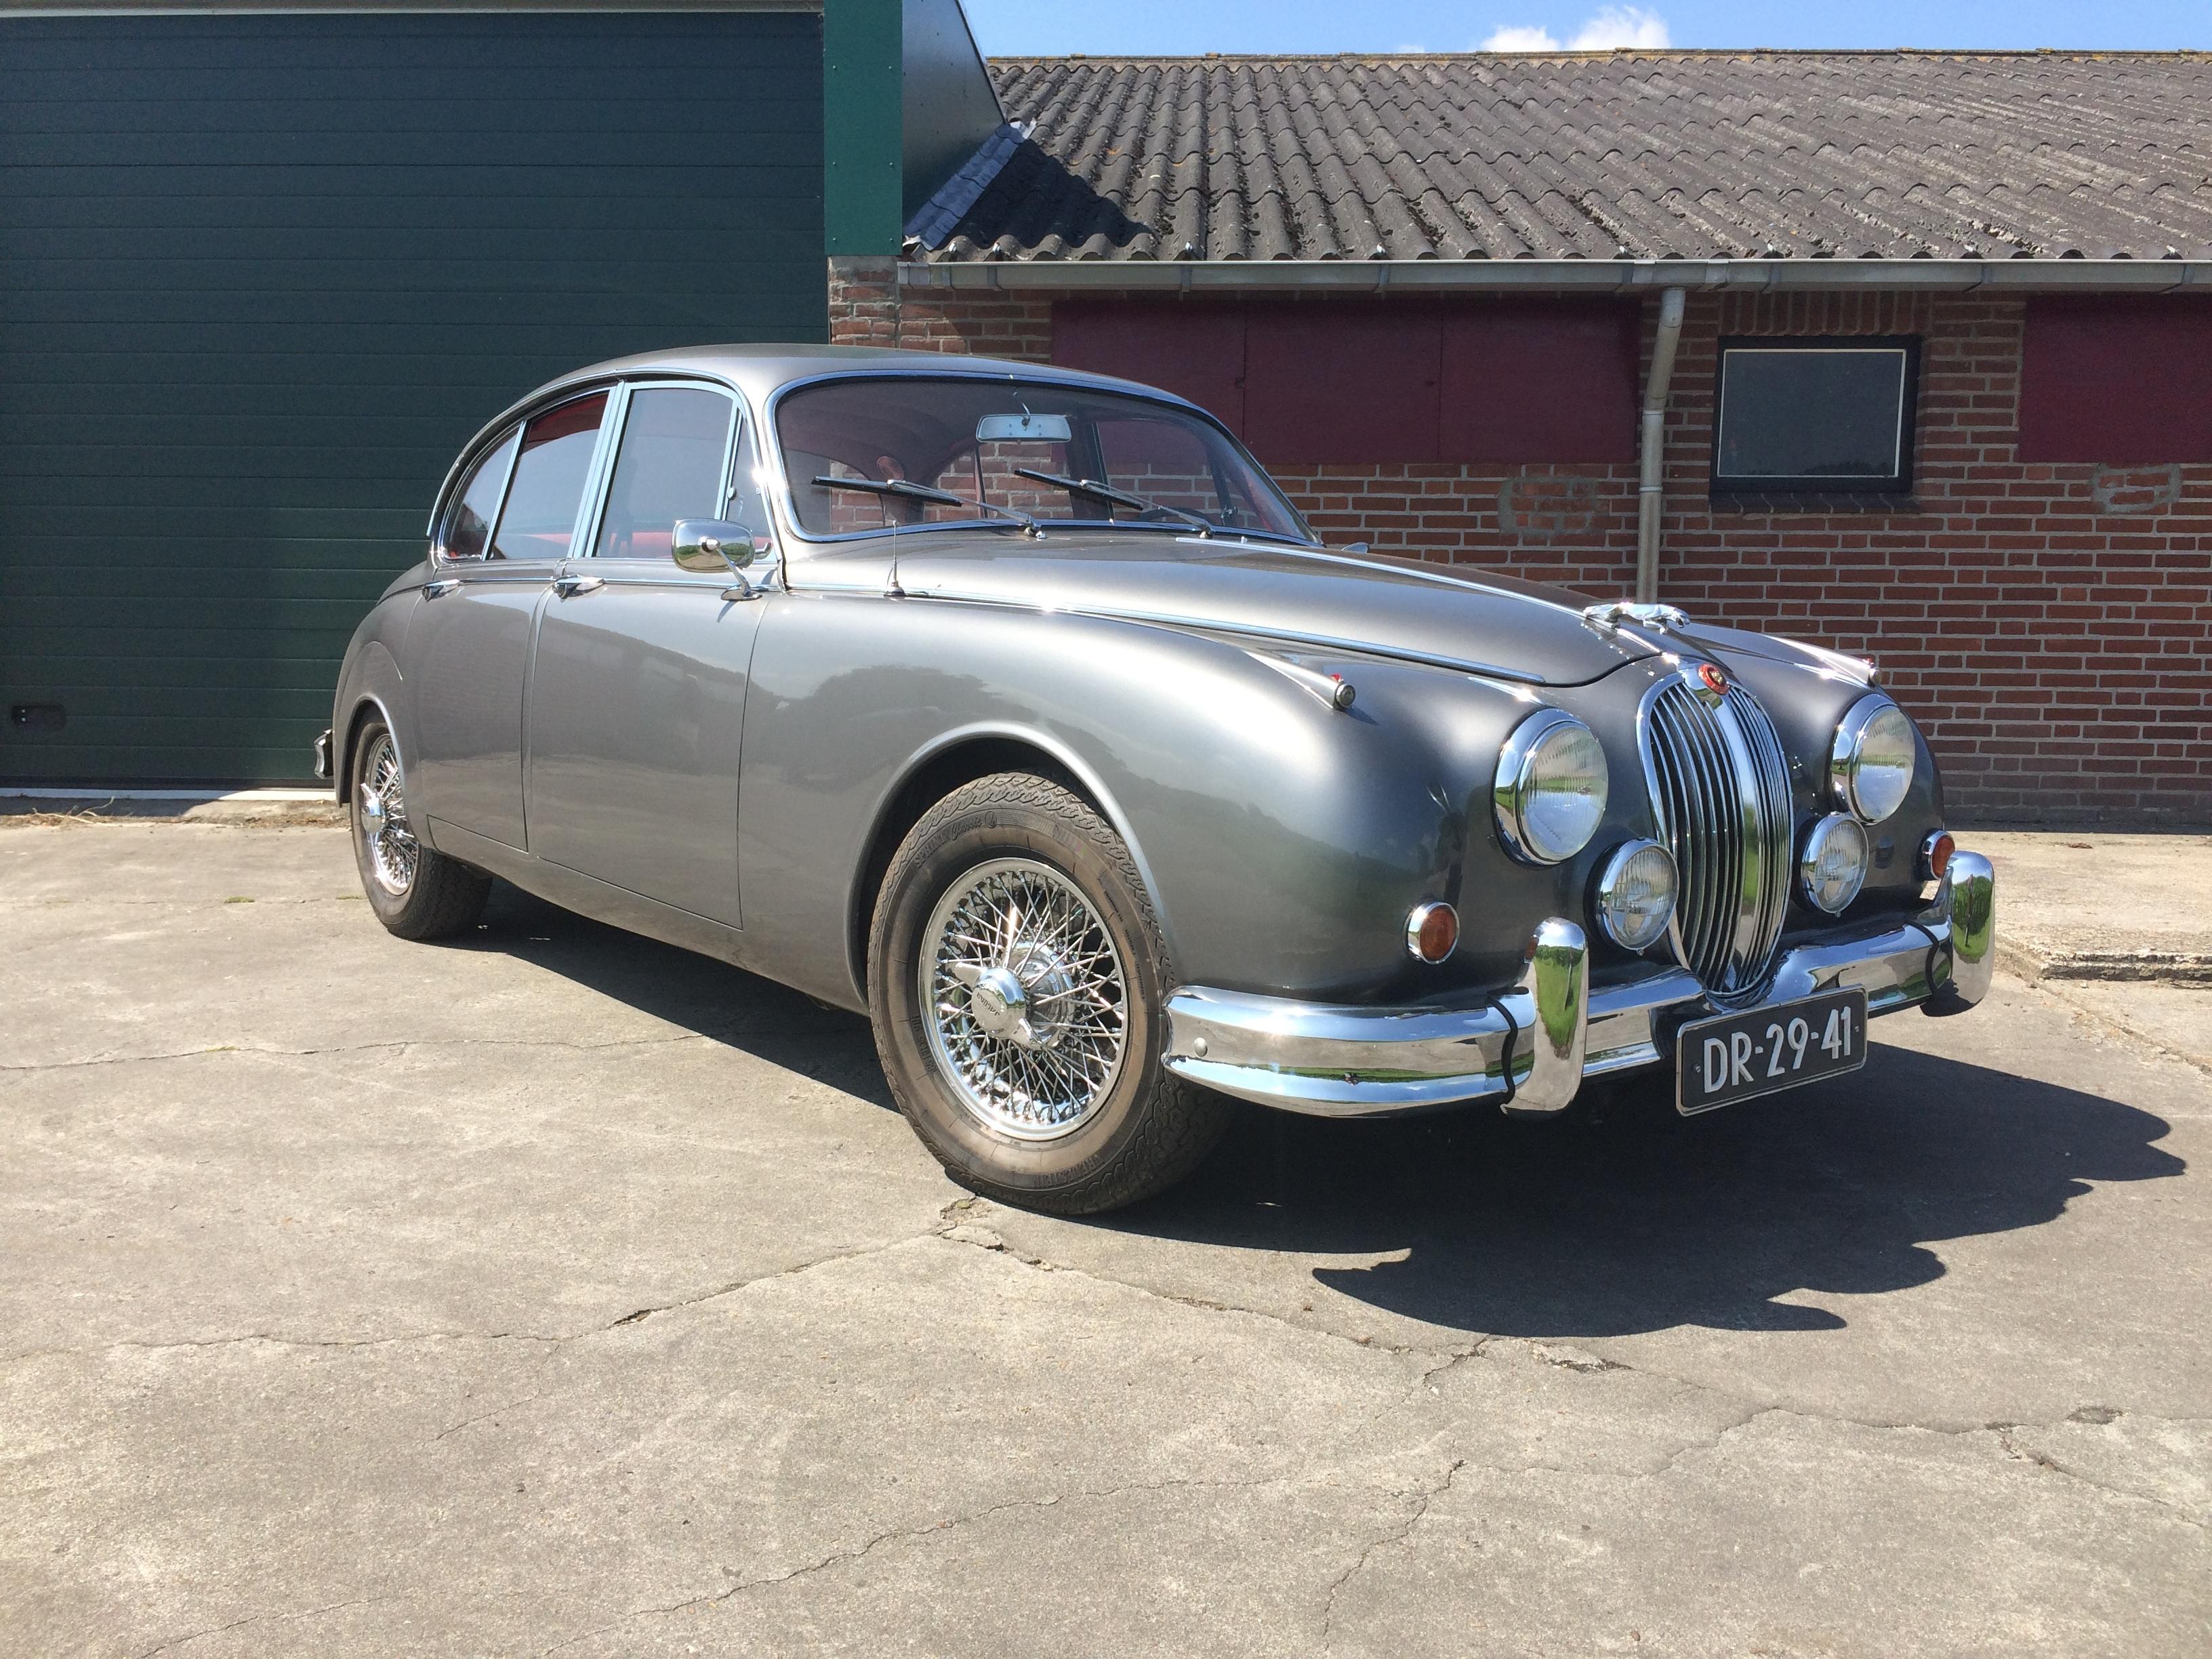 who american away jaguars motor show news make jaguar drive made paris